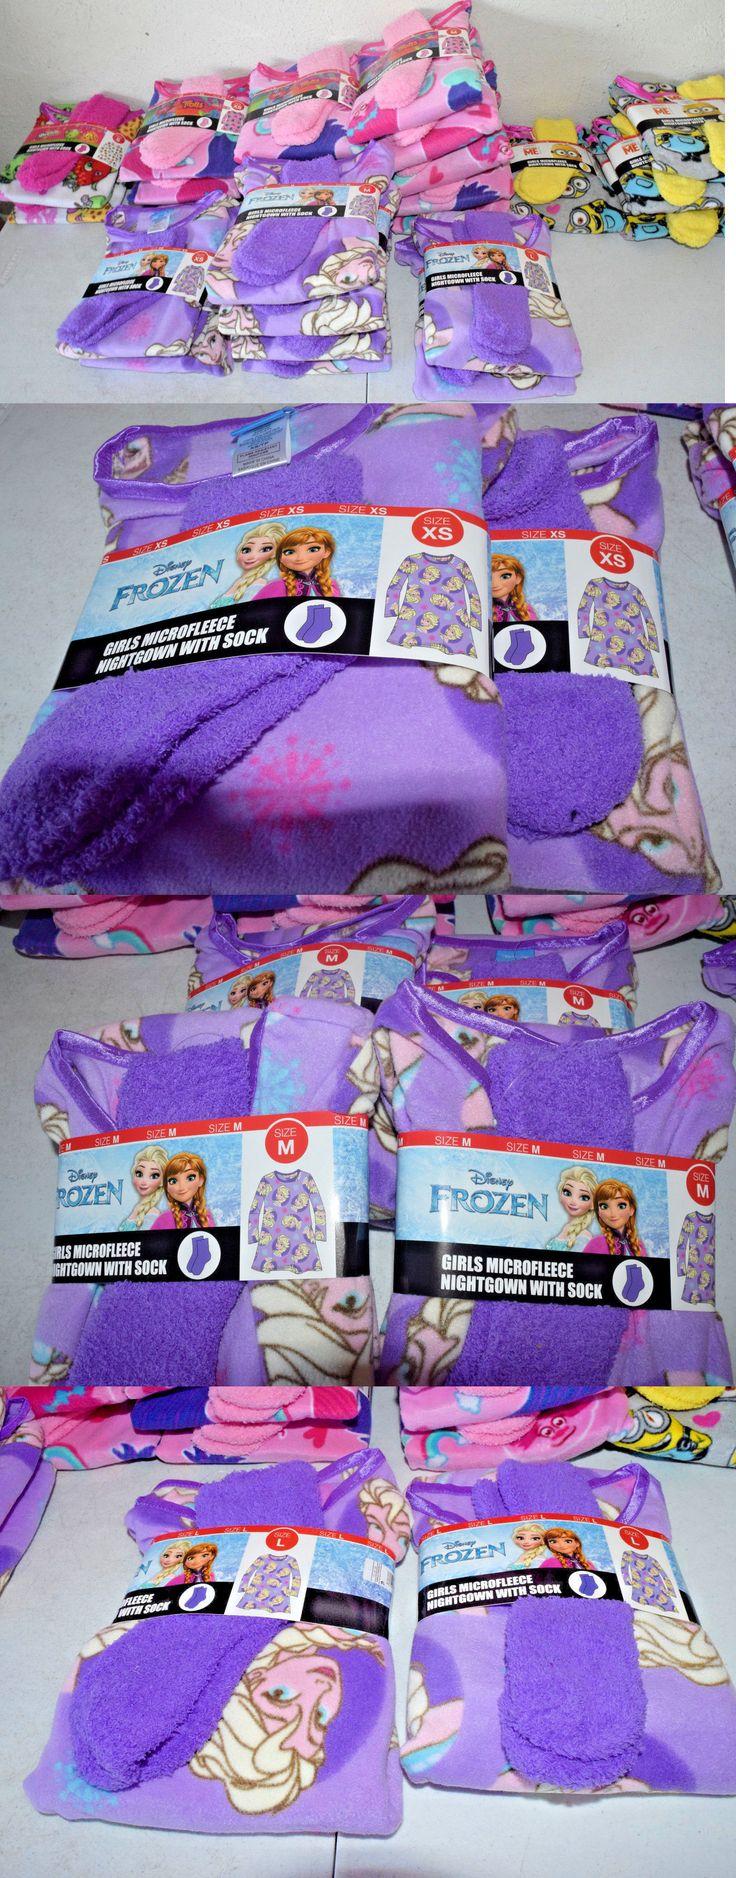 Girls 41965: Girls Nightgown With Socks Pajama Microfleece Lot Of 26 Shopkins Trolls Frozen -> BUY IT NOW ONLY: $123.49 on eBay!